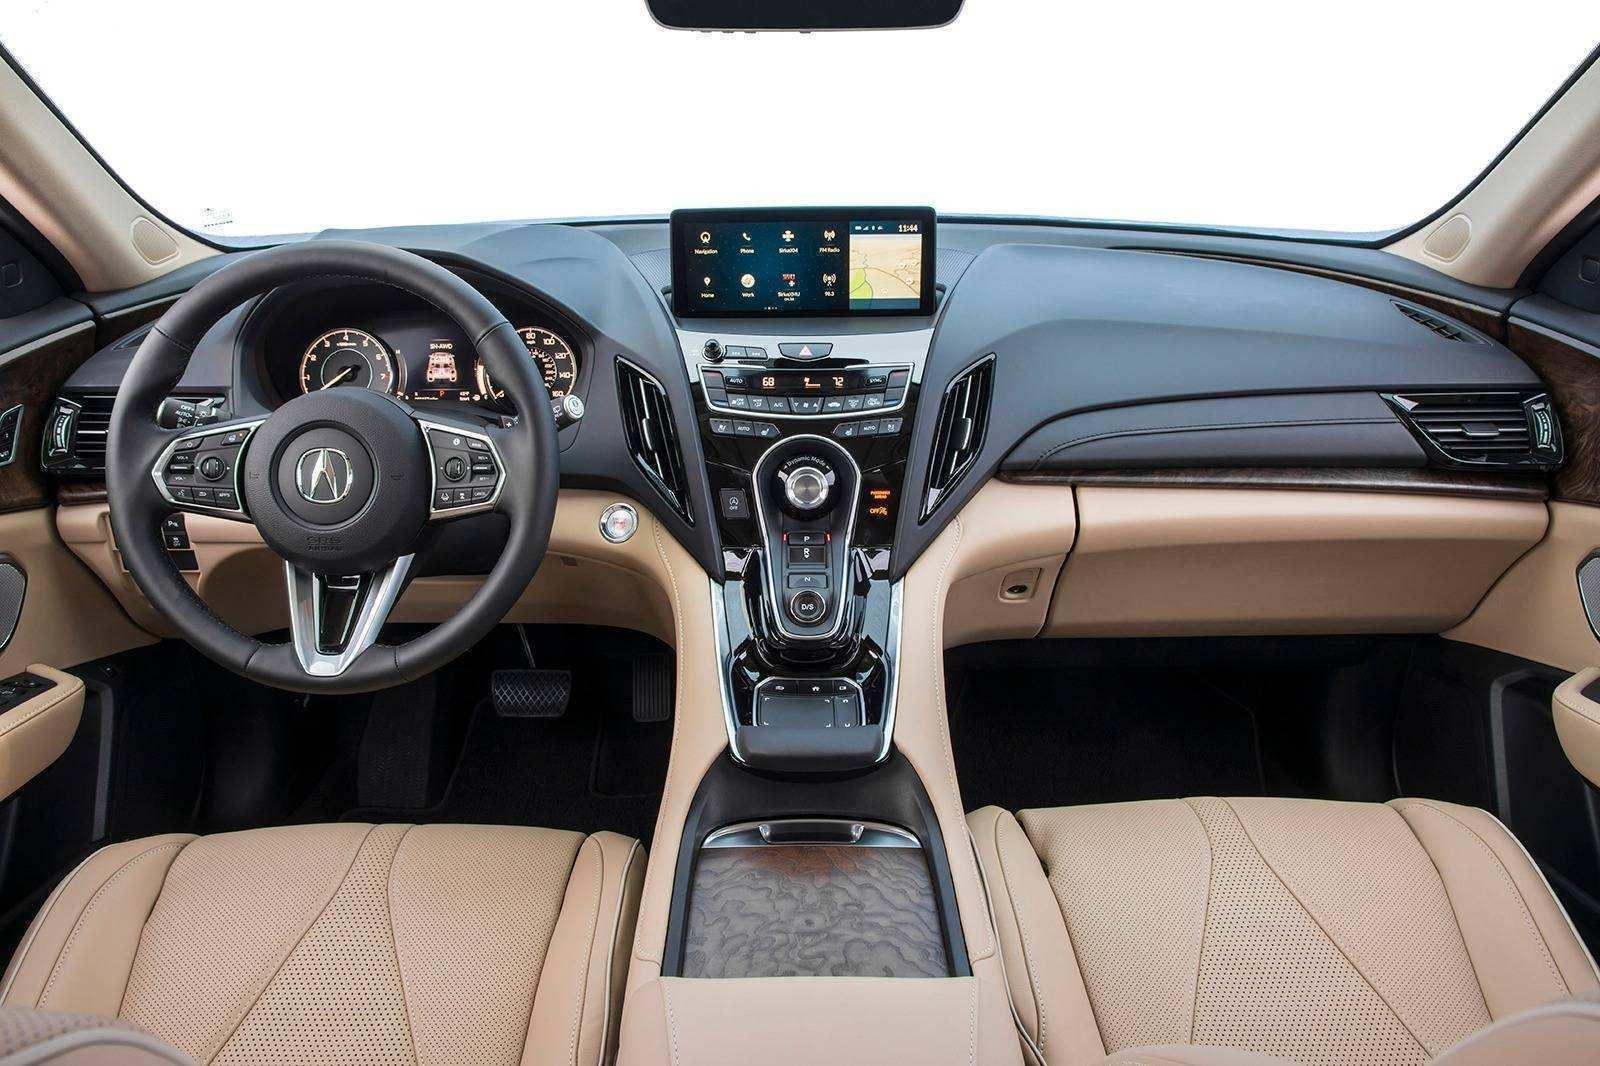 88 All New 2019 Acura Zdx Model for 2019 Acura Zdx